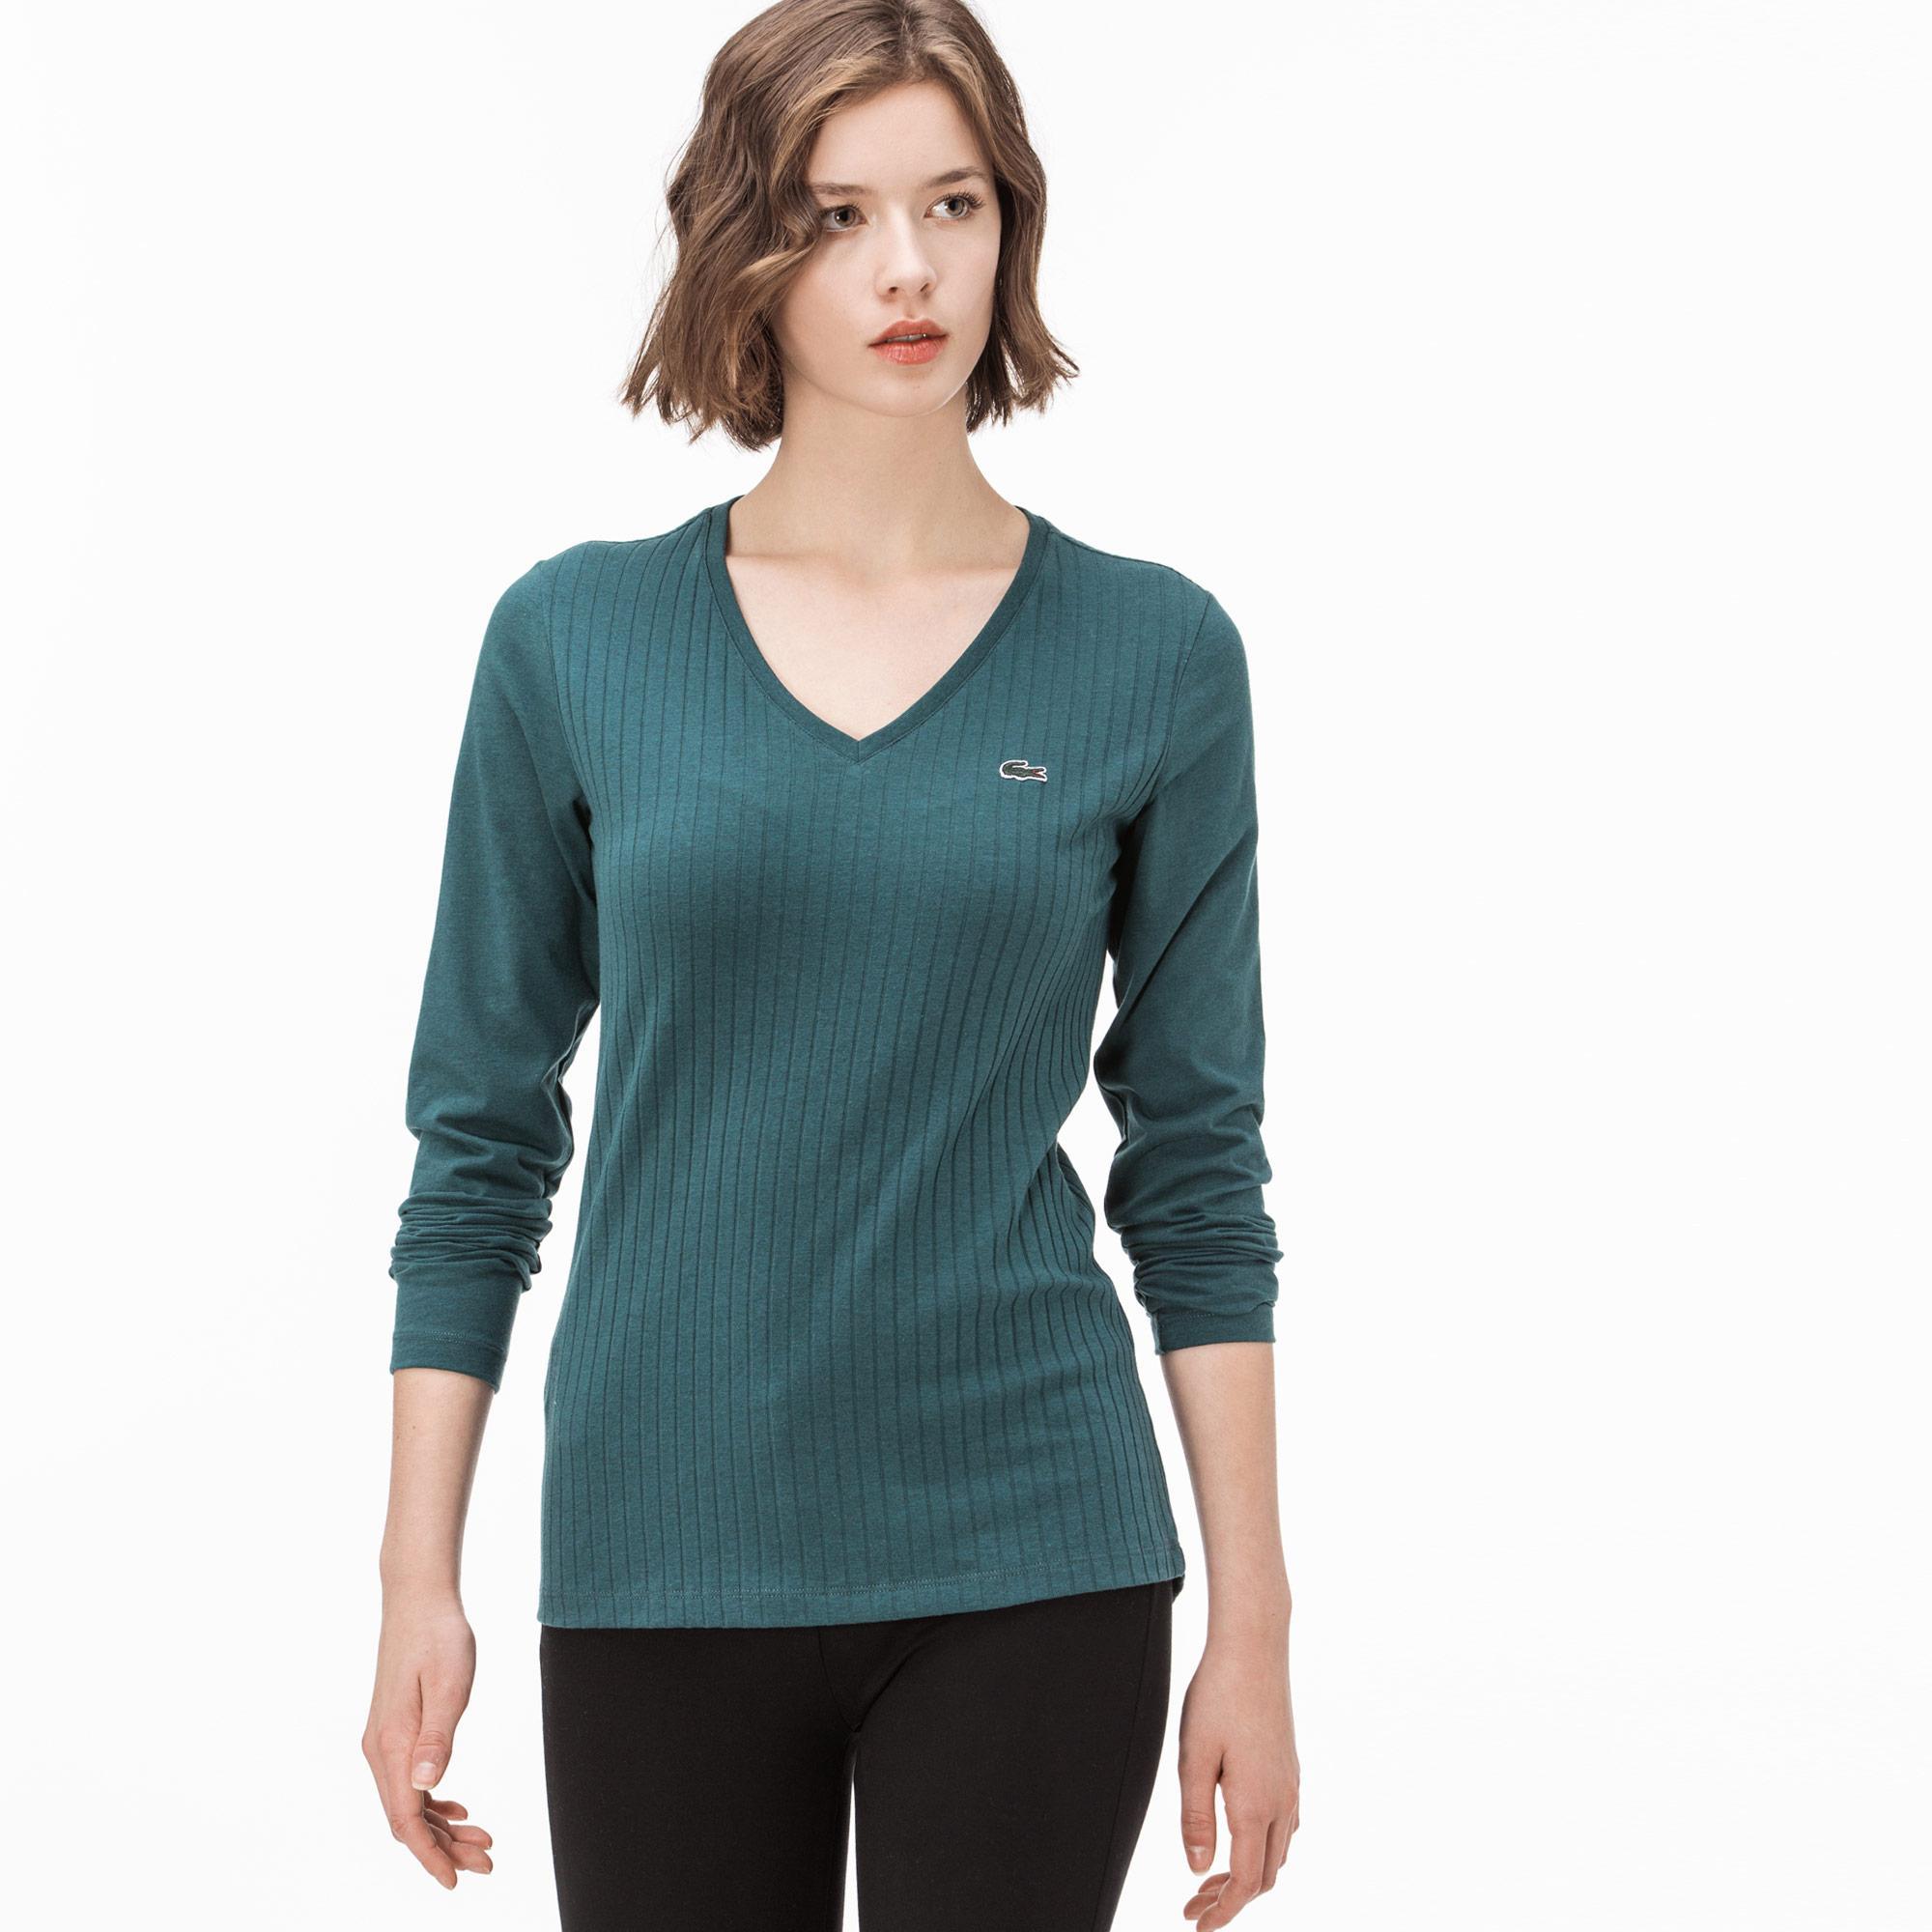 Lacoste Kadın Yeşil V Yaka T-Shirt